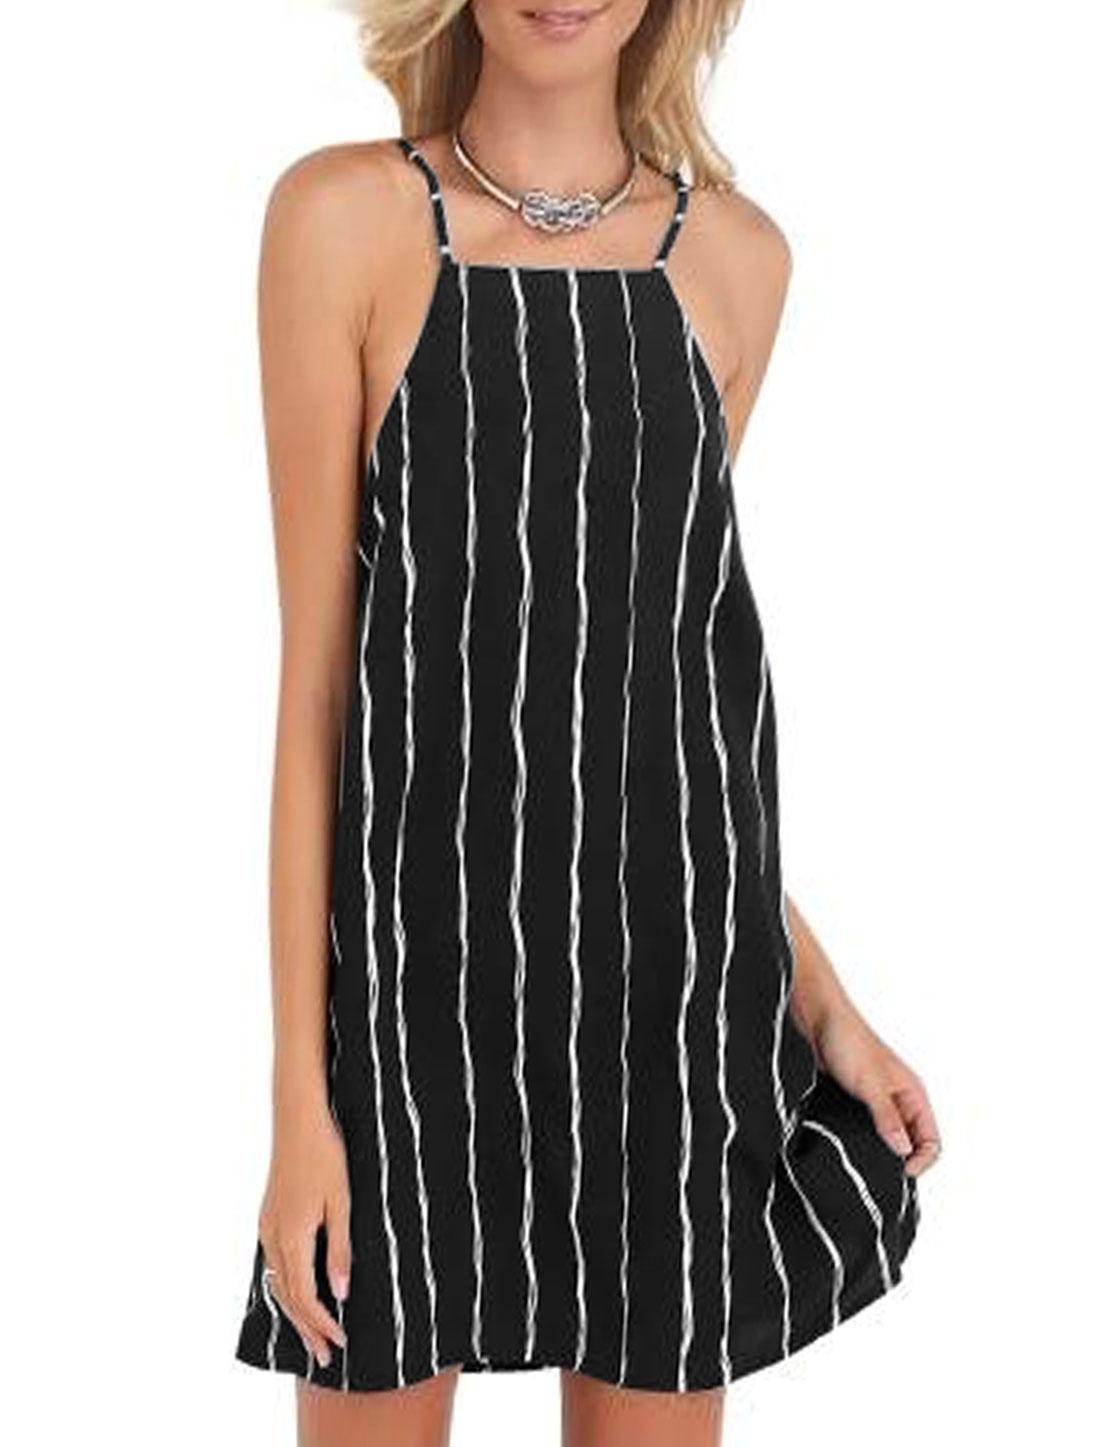 Women Spaghetti Straps Sleeveless Stripes Mini Cami Dress Black L